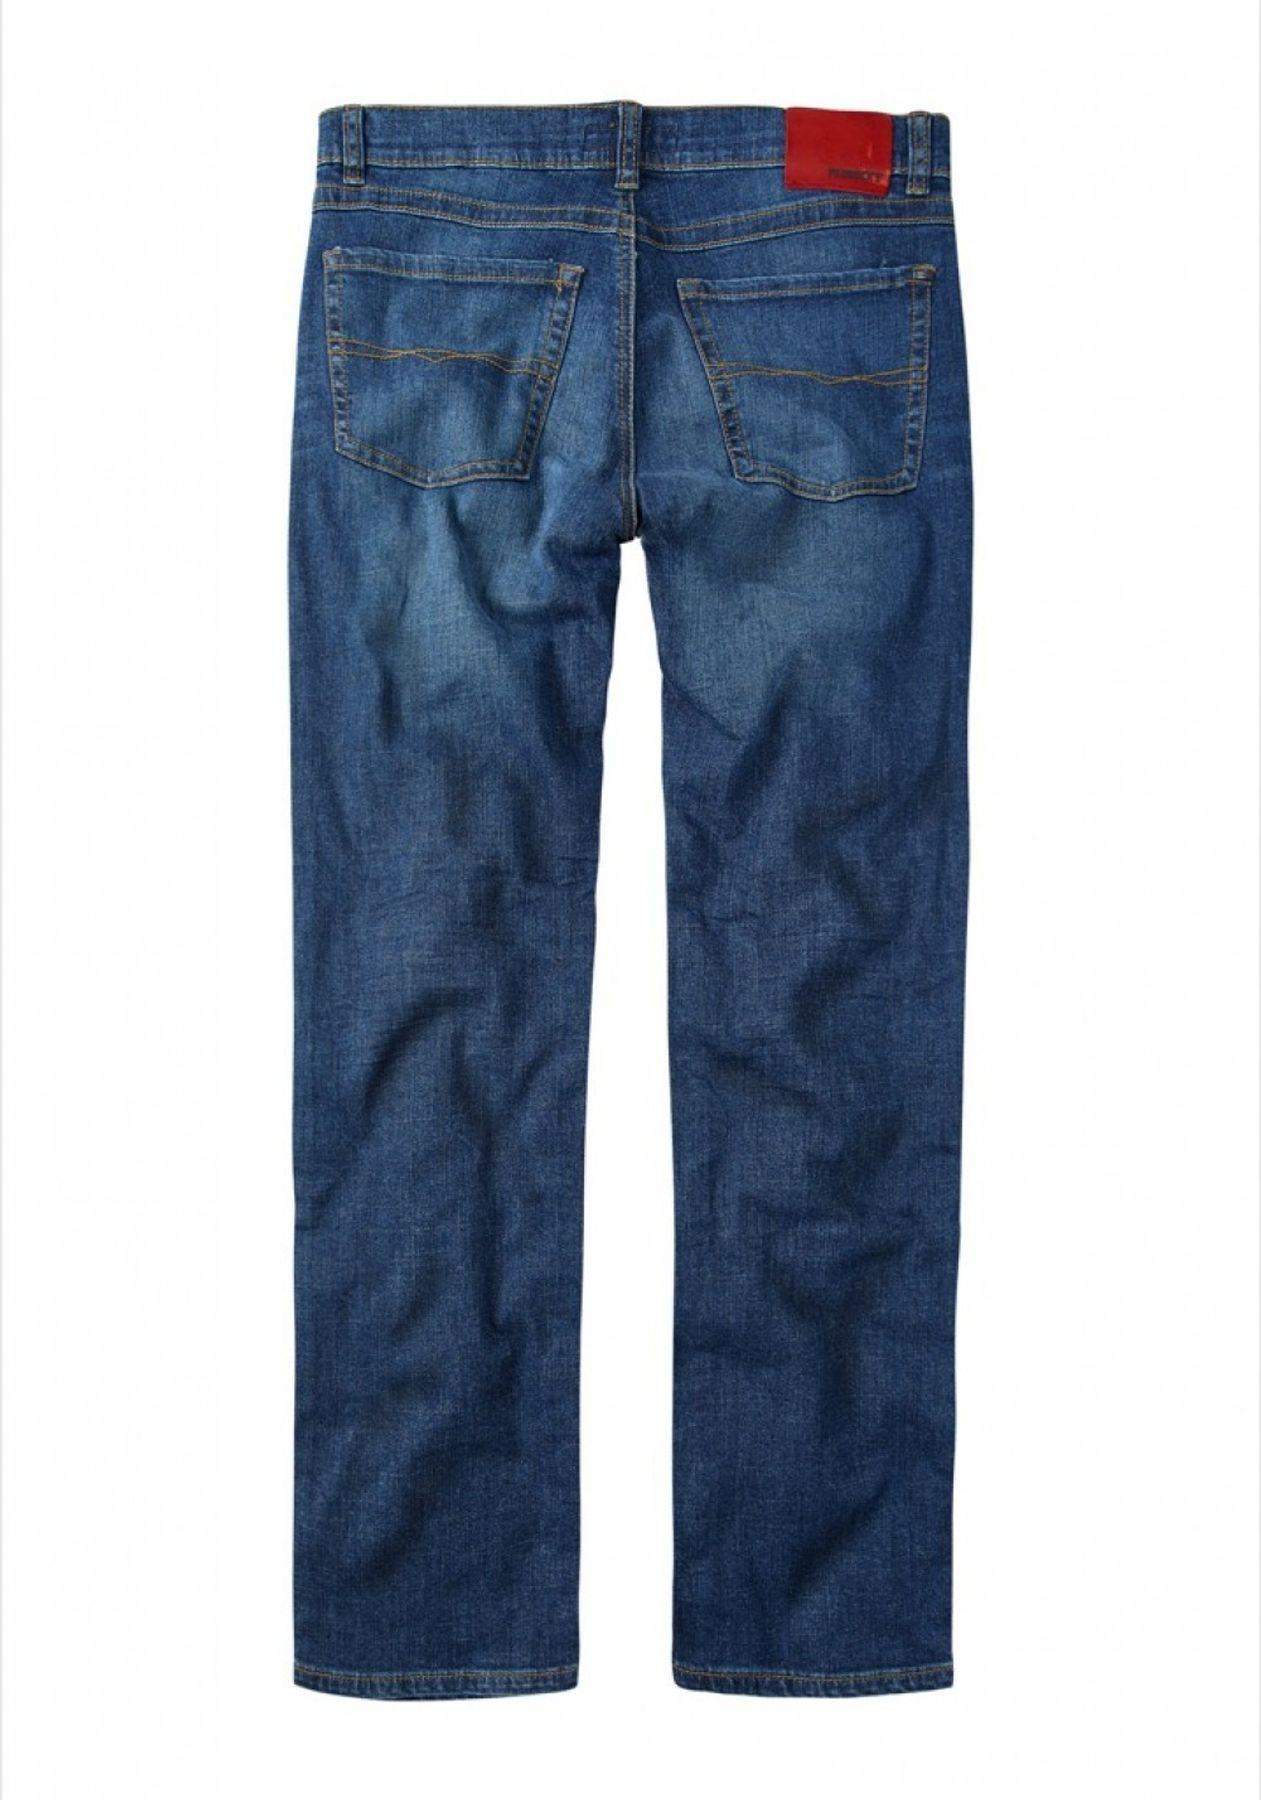 Paddock's Herren 5-Pocket Jeans in Farben blue/black used moustache (5785) und blue dark stone used moustache (5475), Carter 80 016 5024 – Bild 2